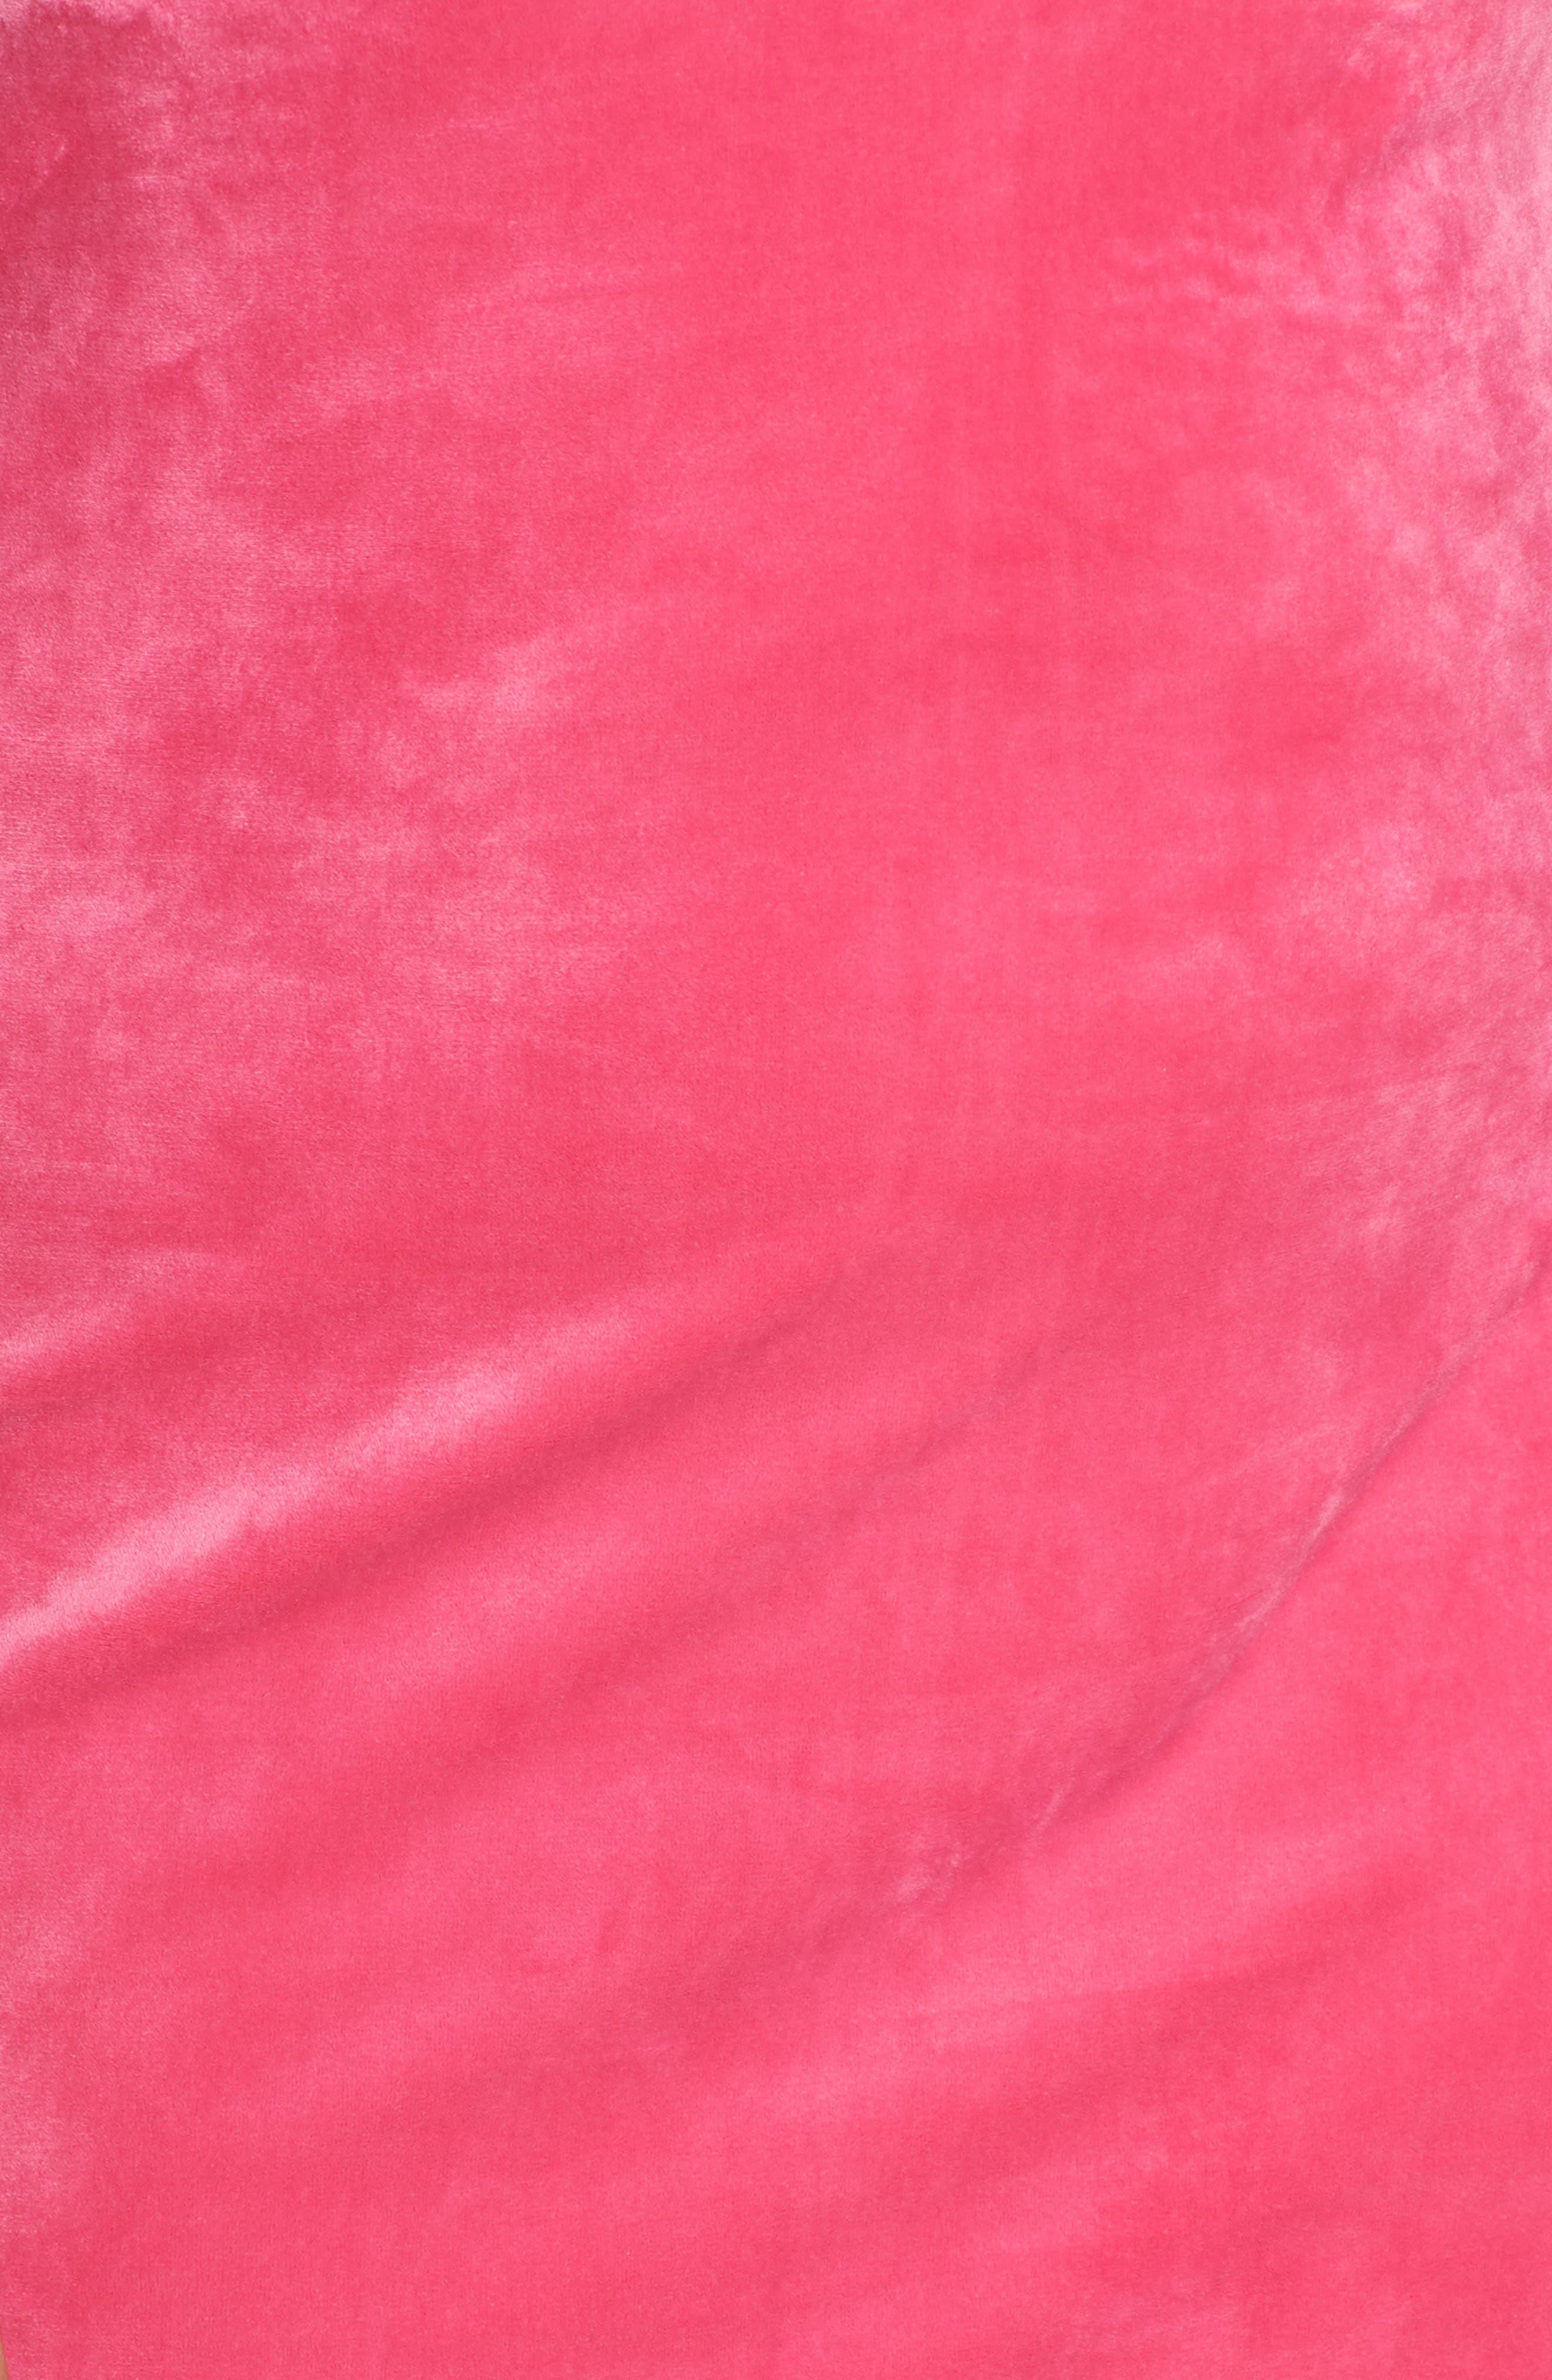 Endless Night Velour Shift Dress,                             Alternate thumbnail 6, color,                             STREET PNK